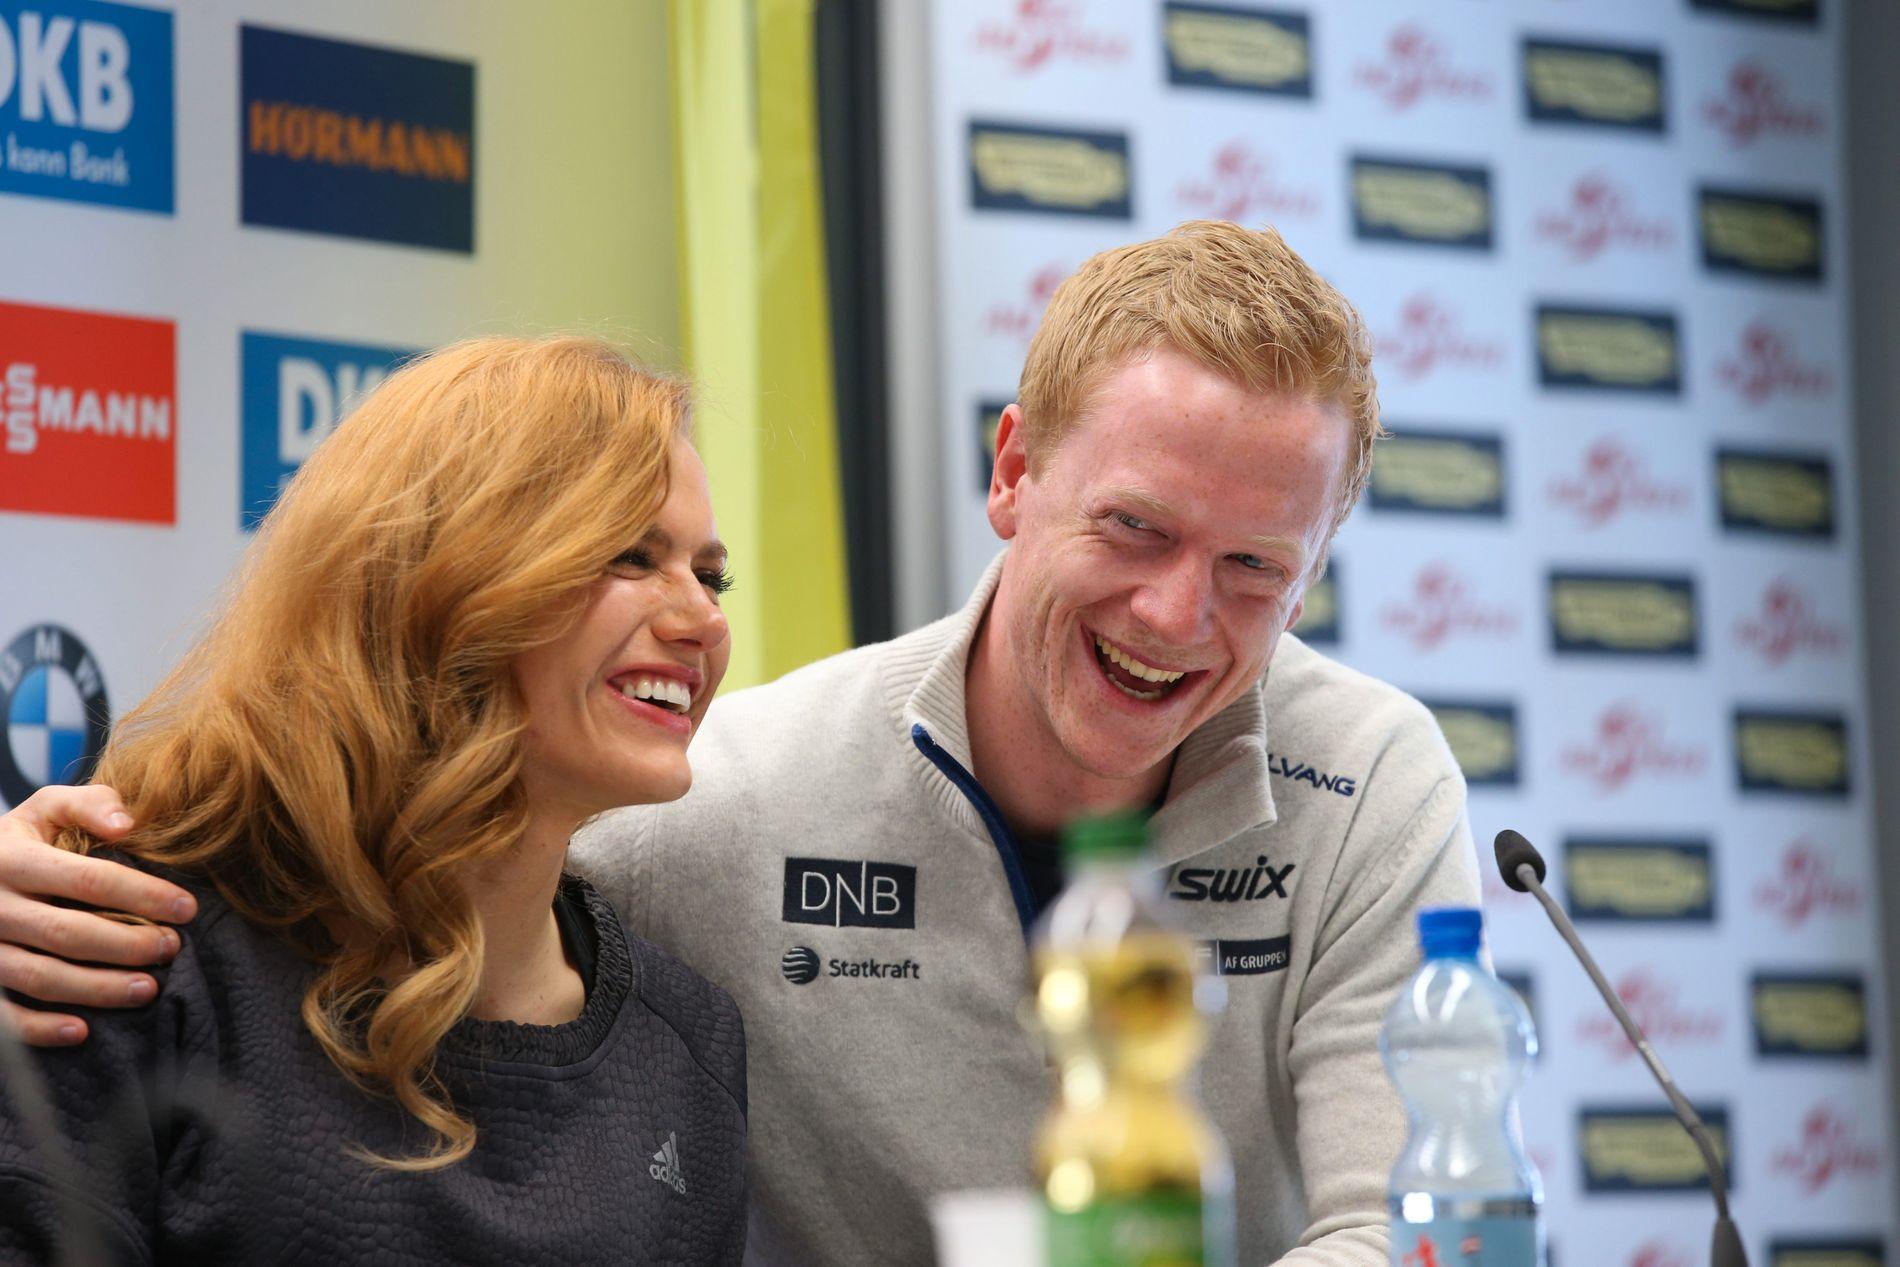 GOD LATTER: Gabriela Koukalová ler godt under en pressekonferanse i VM i Hochfilzen i 2017 - etter at Johannes Thingnes Bø har kommet med en god replikk.